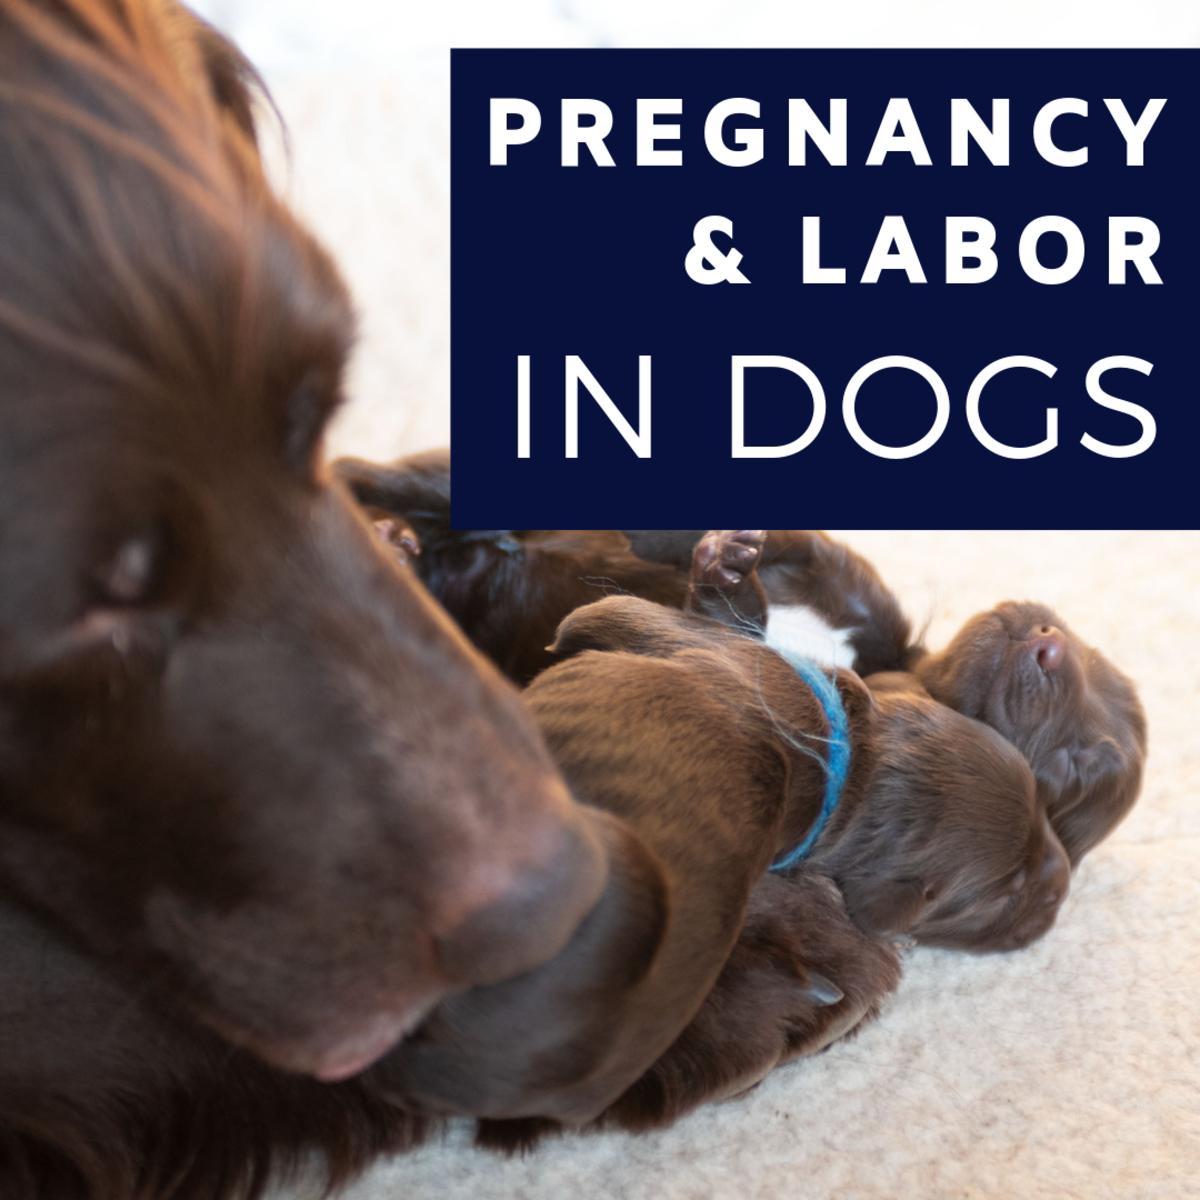 Gestation in Dogs